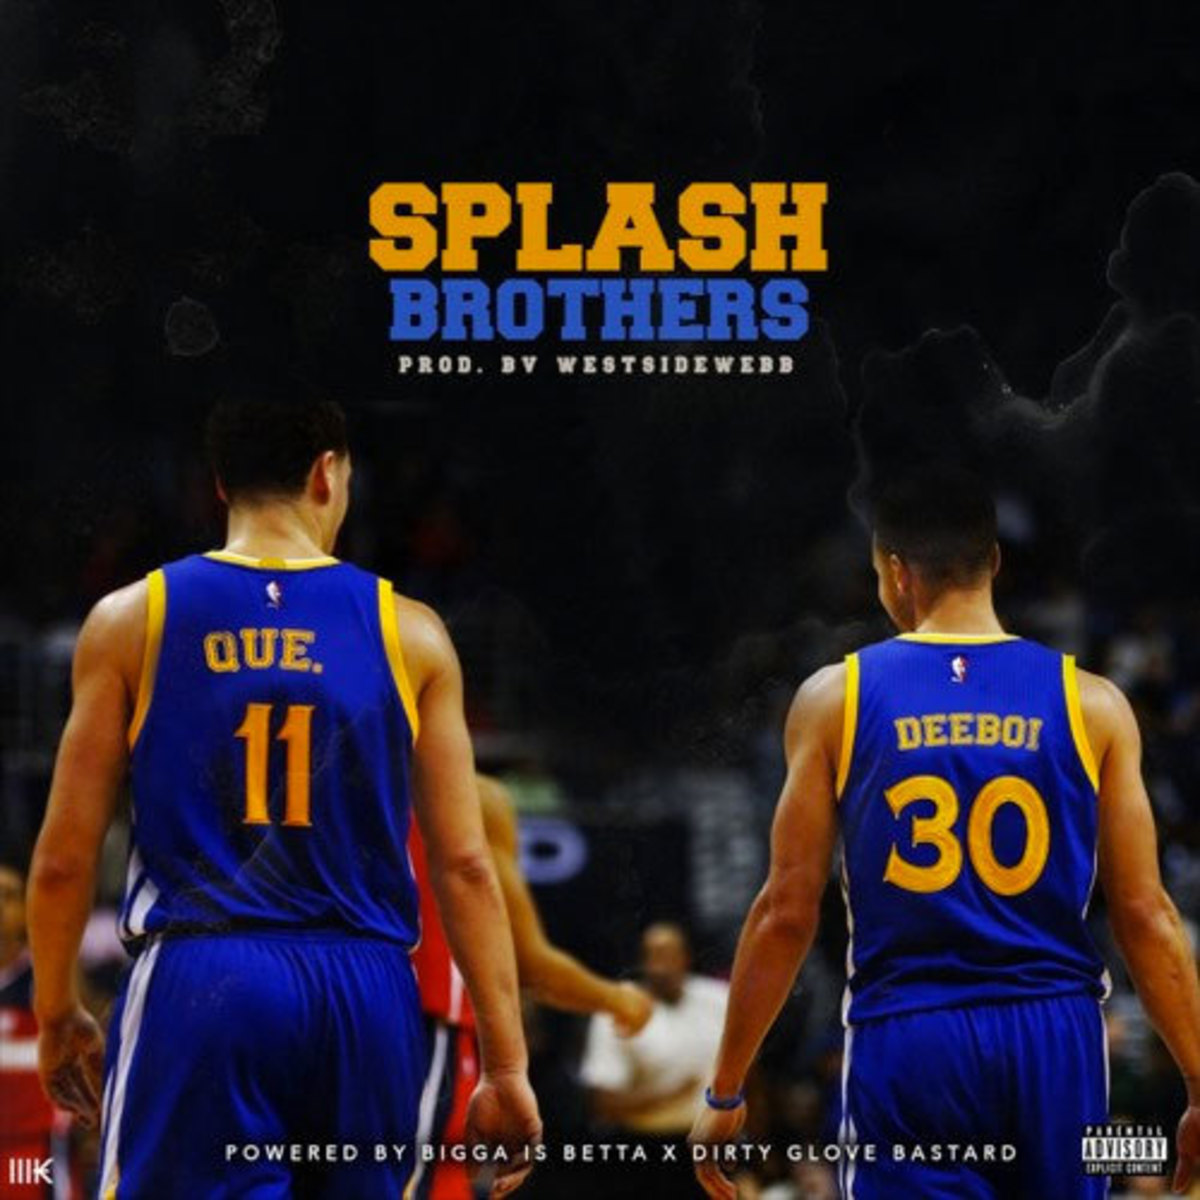 que-splash-brothers.jpg